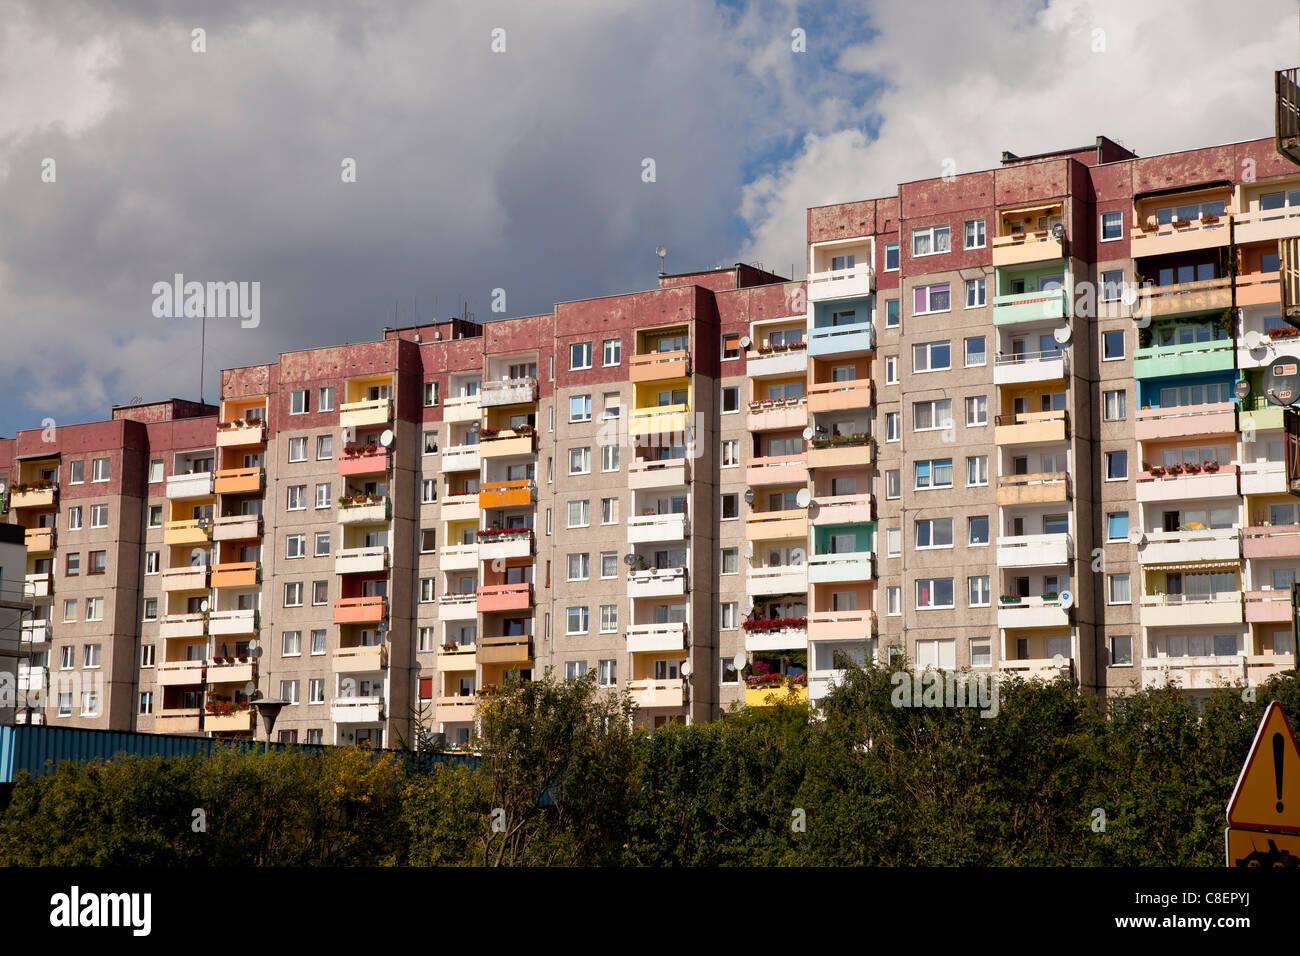 east european apartment blocks Panelak or Plattenbauten in the centre of Swinoujscie, Uznam Island, Poland, Europe Stock Photo